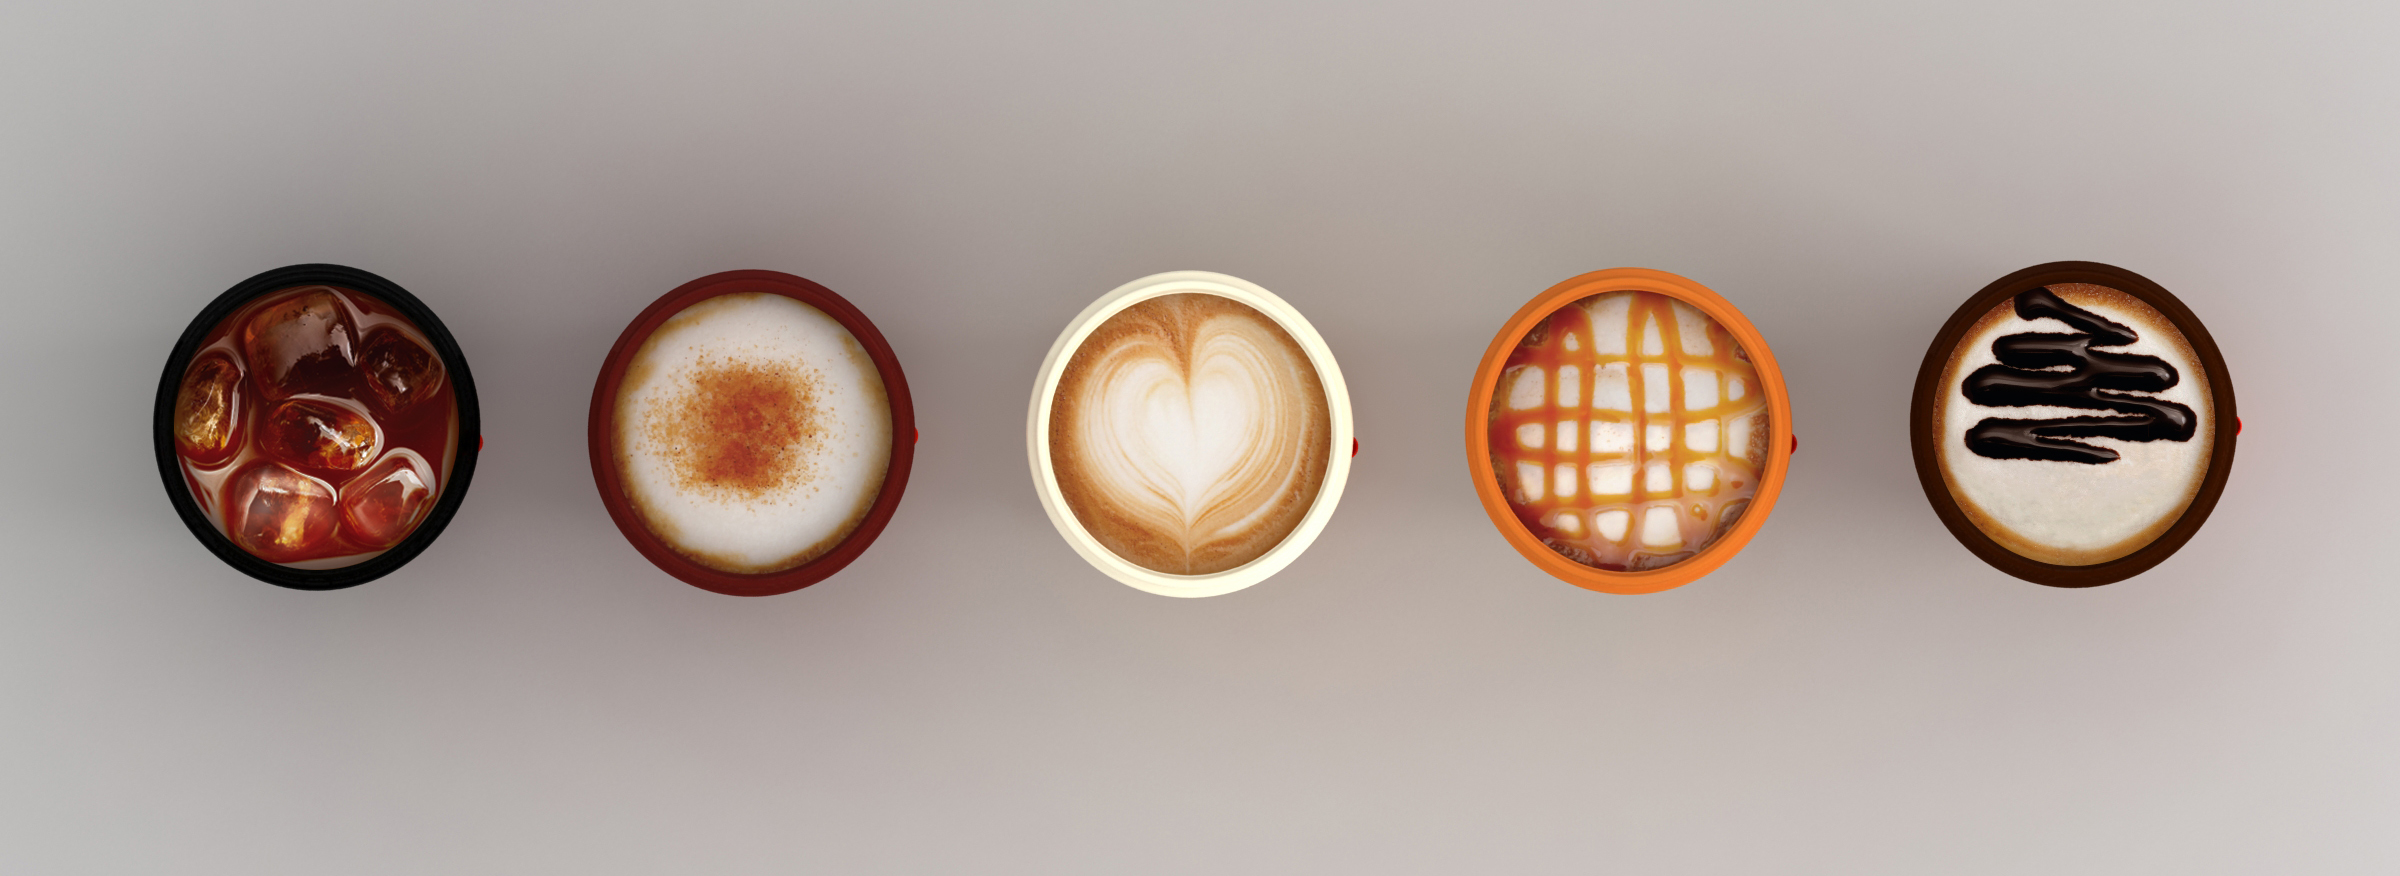 caffe latte lid